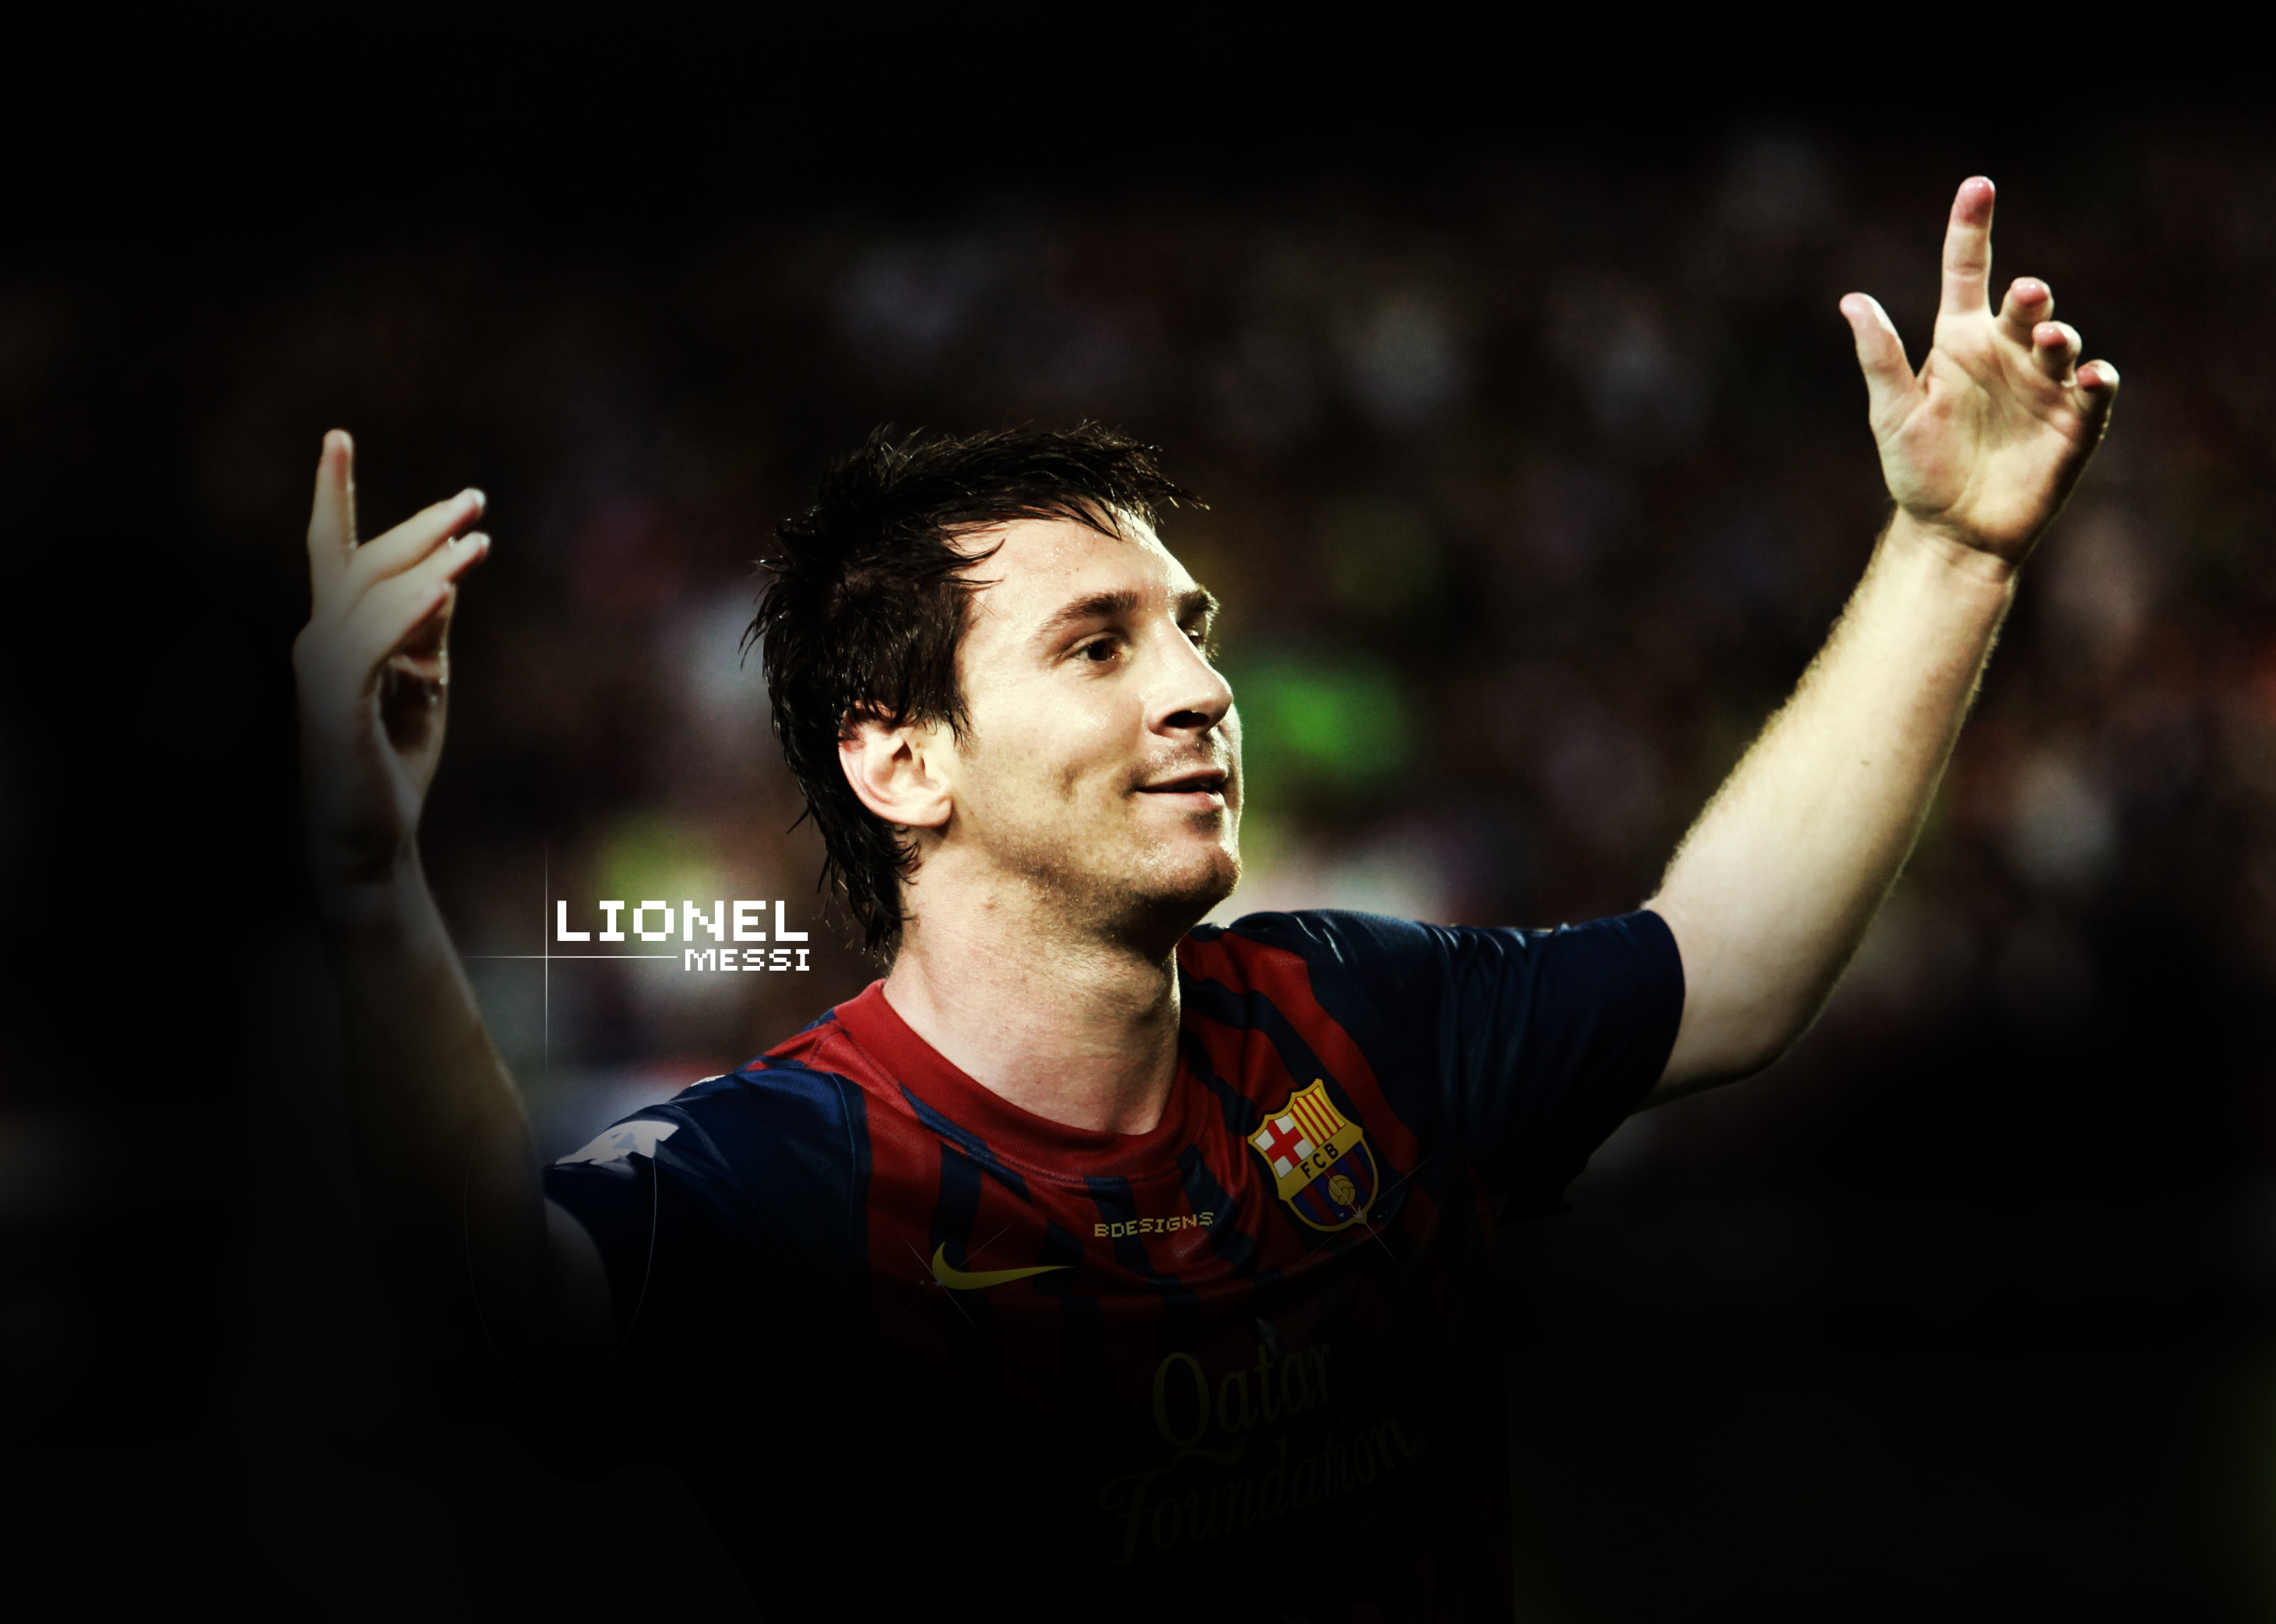 Free Lionel Messi Wallpaper By Kingofdesigndesign On DeviantArt